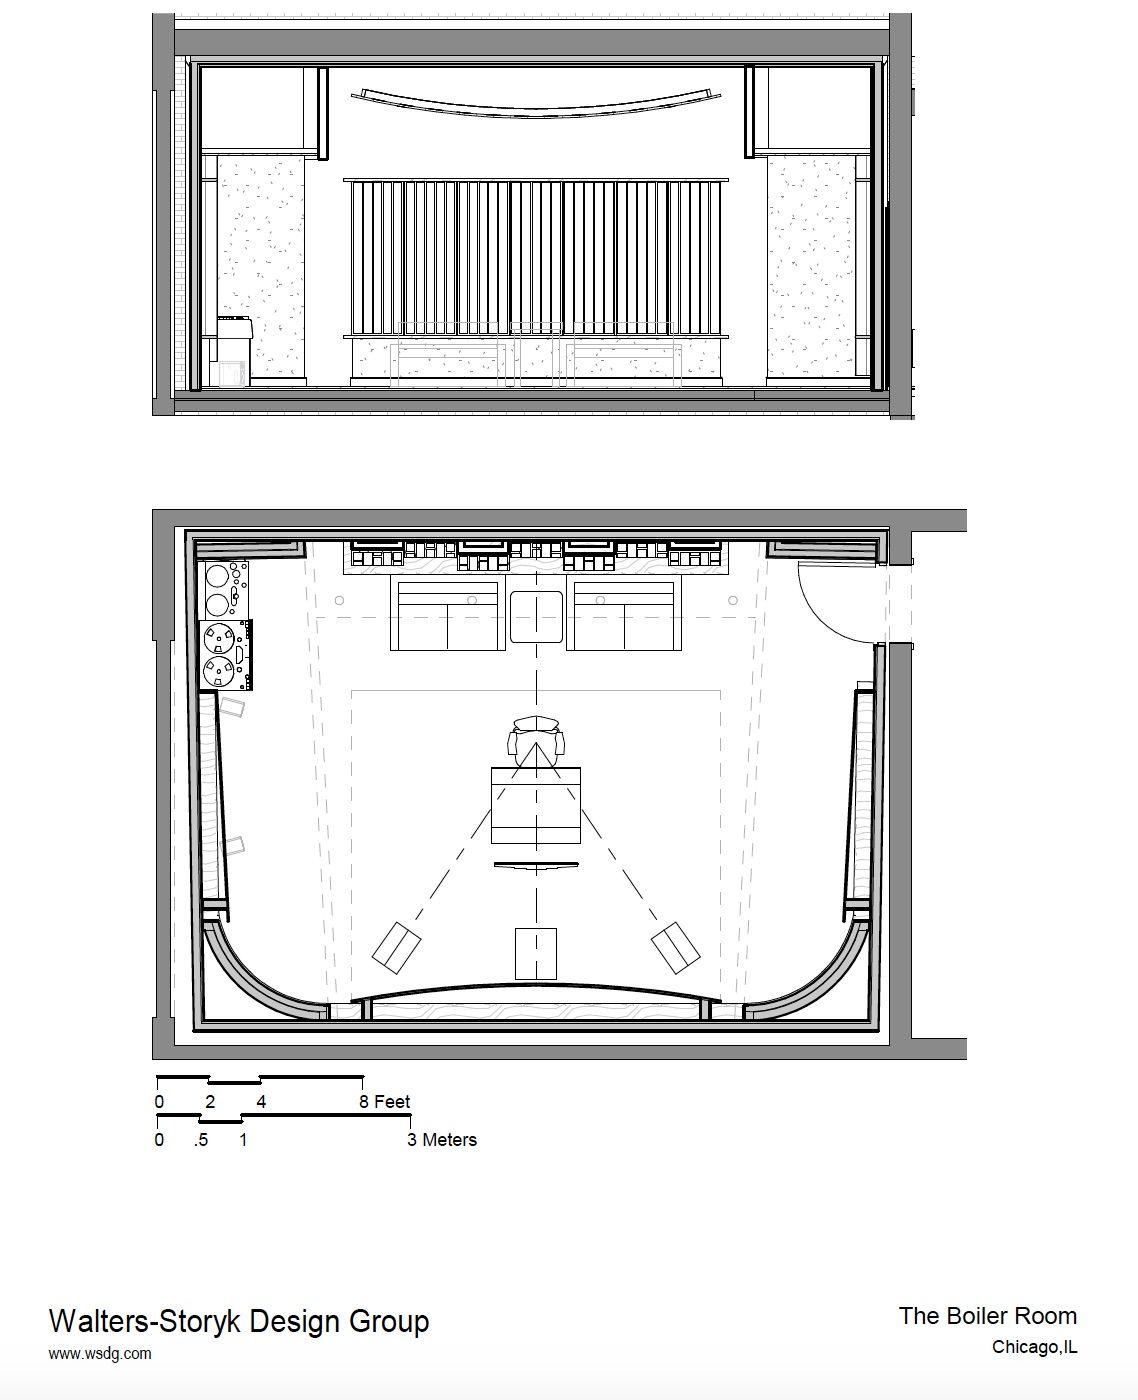 The Boiler Room Enlarged Plan